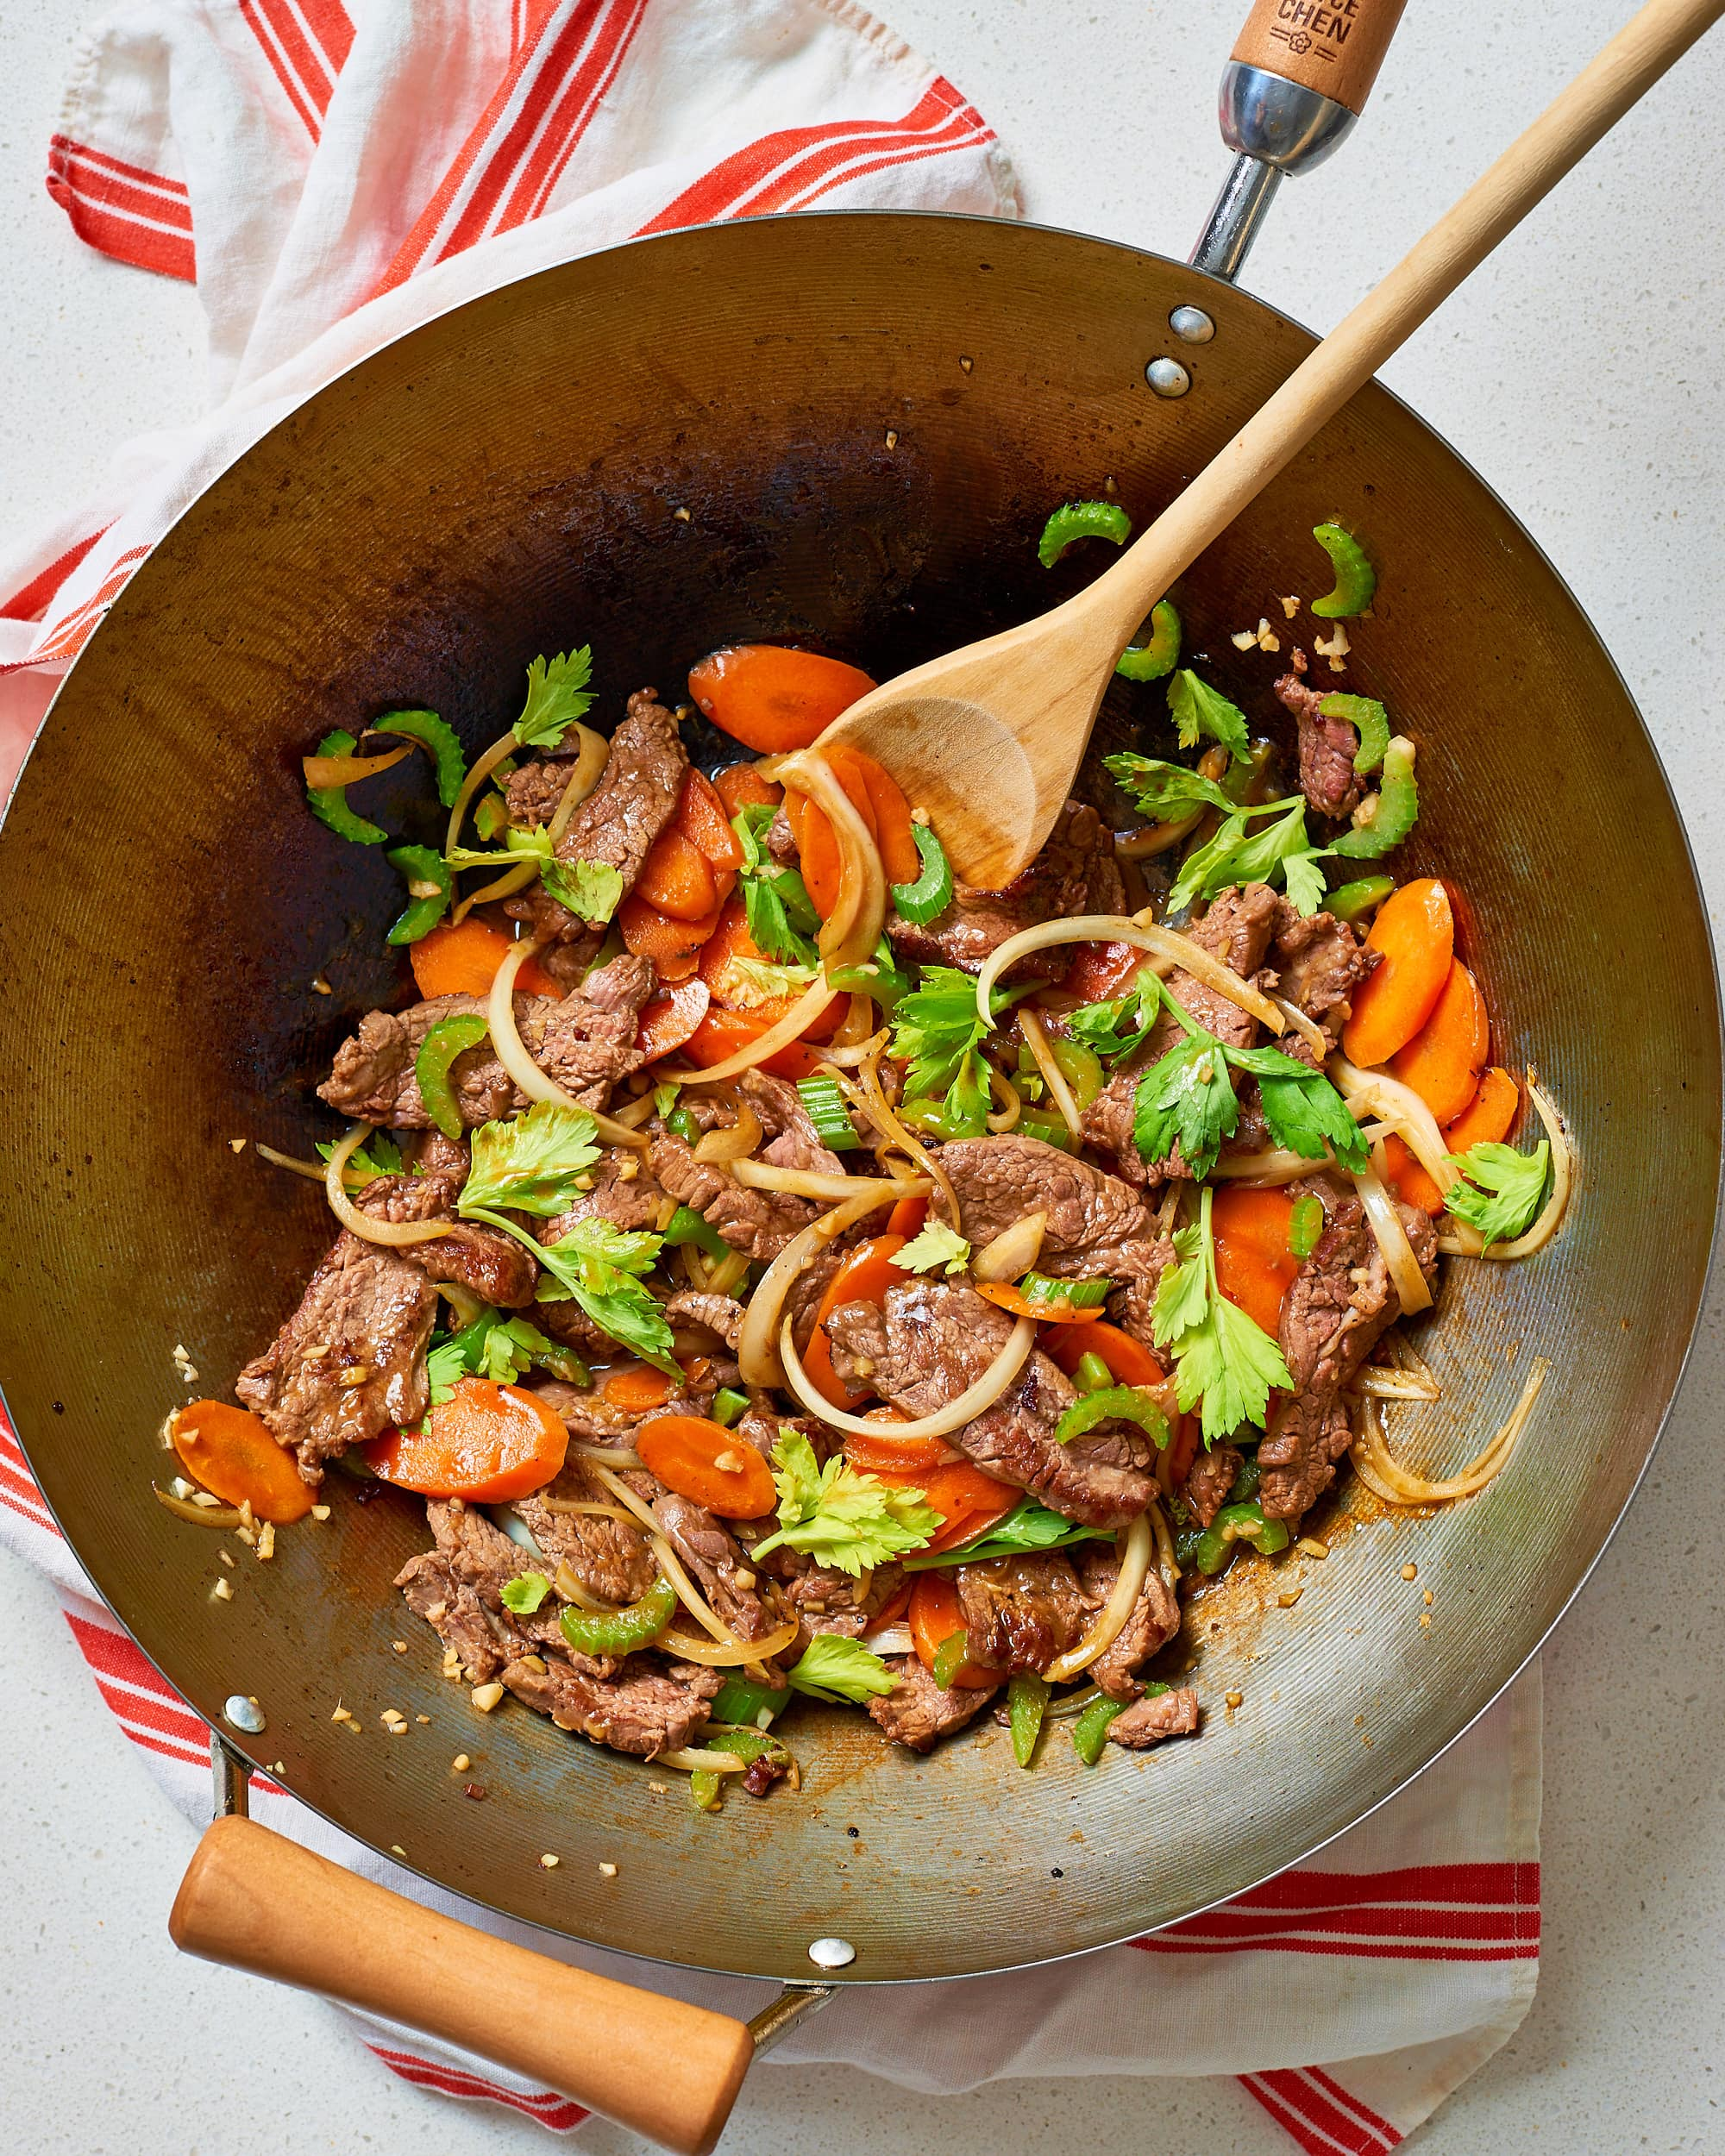 Recipe: Beef And Celery Stir-Fry